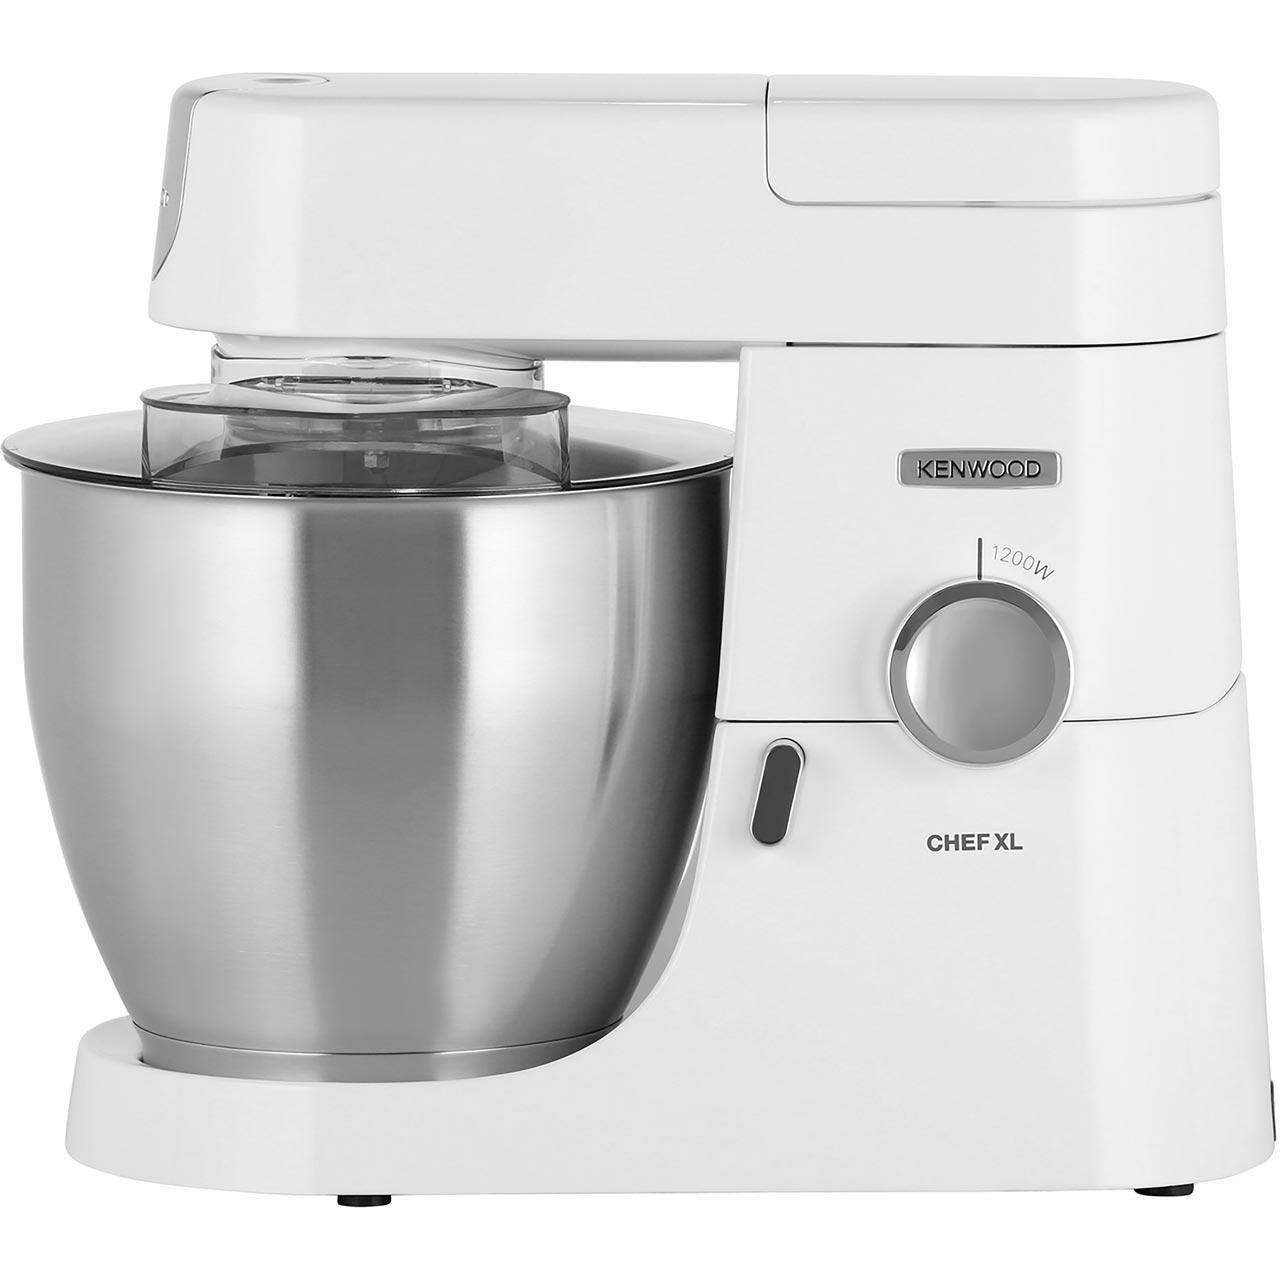 Kenwood Premier Chef Xl Kvl4100w Stand Mixer White